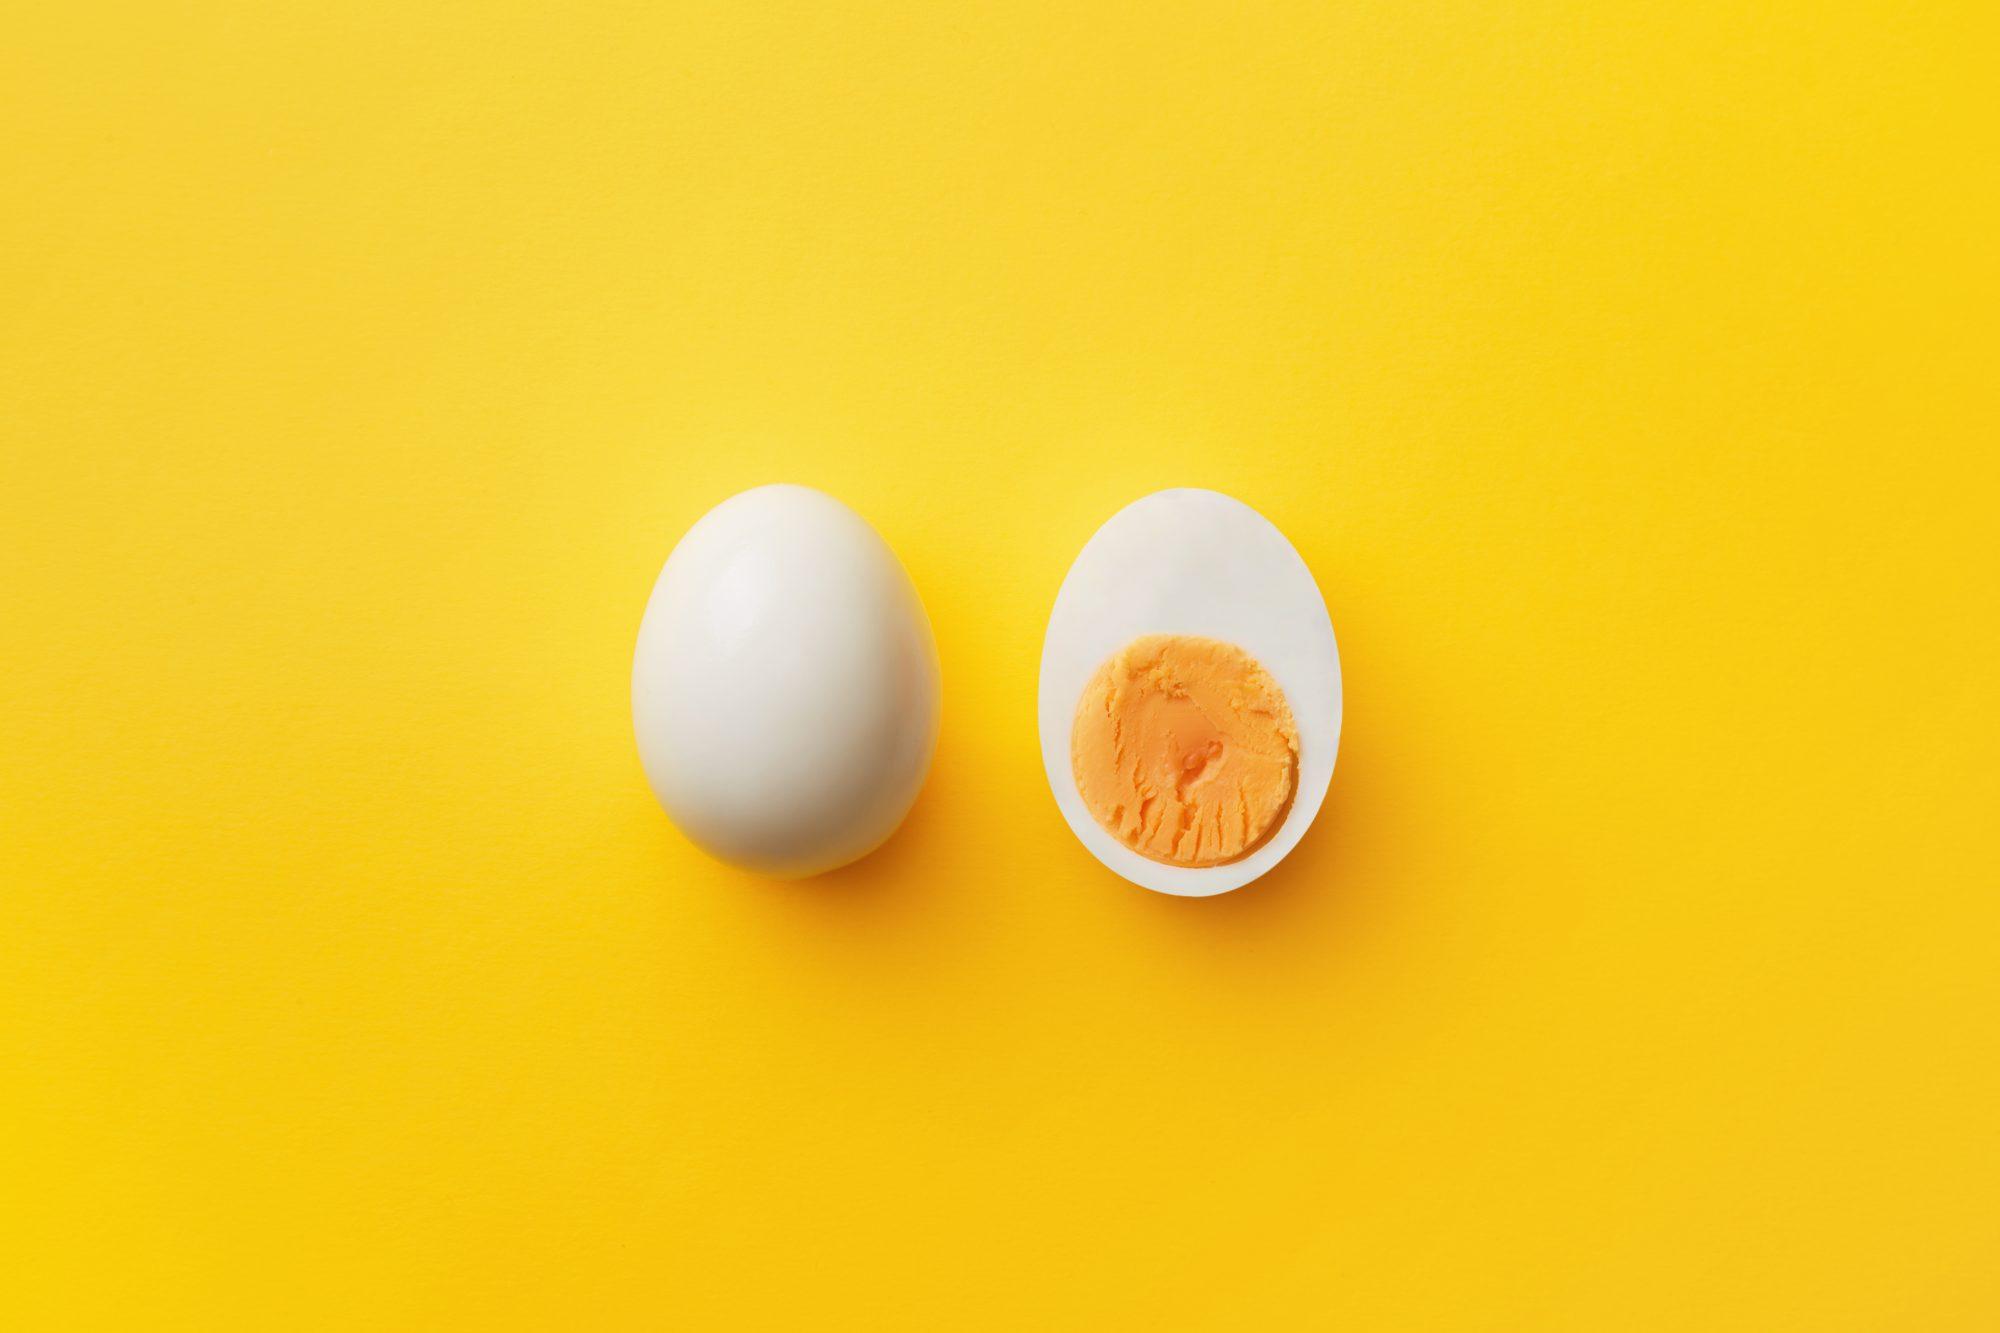 Getty 2/6/20 Eggs